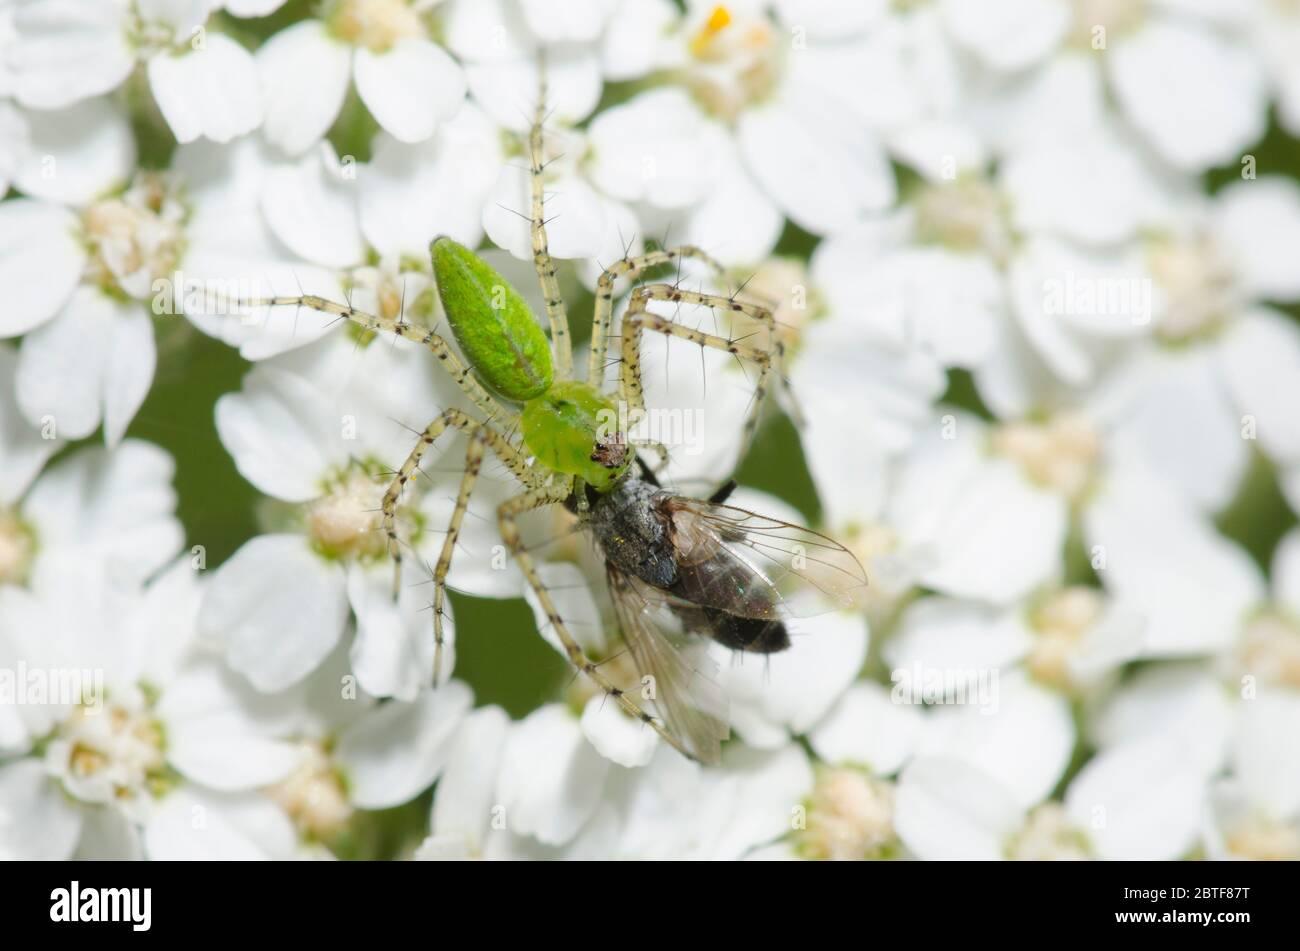 Green Lynx Spider, Peucetia viridans, feeding on captured tachinid fly, Family Tachinidae, on yarrow, Achillea millefolium Stock Photo